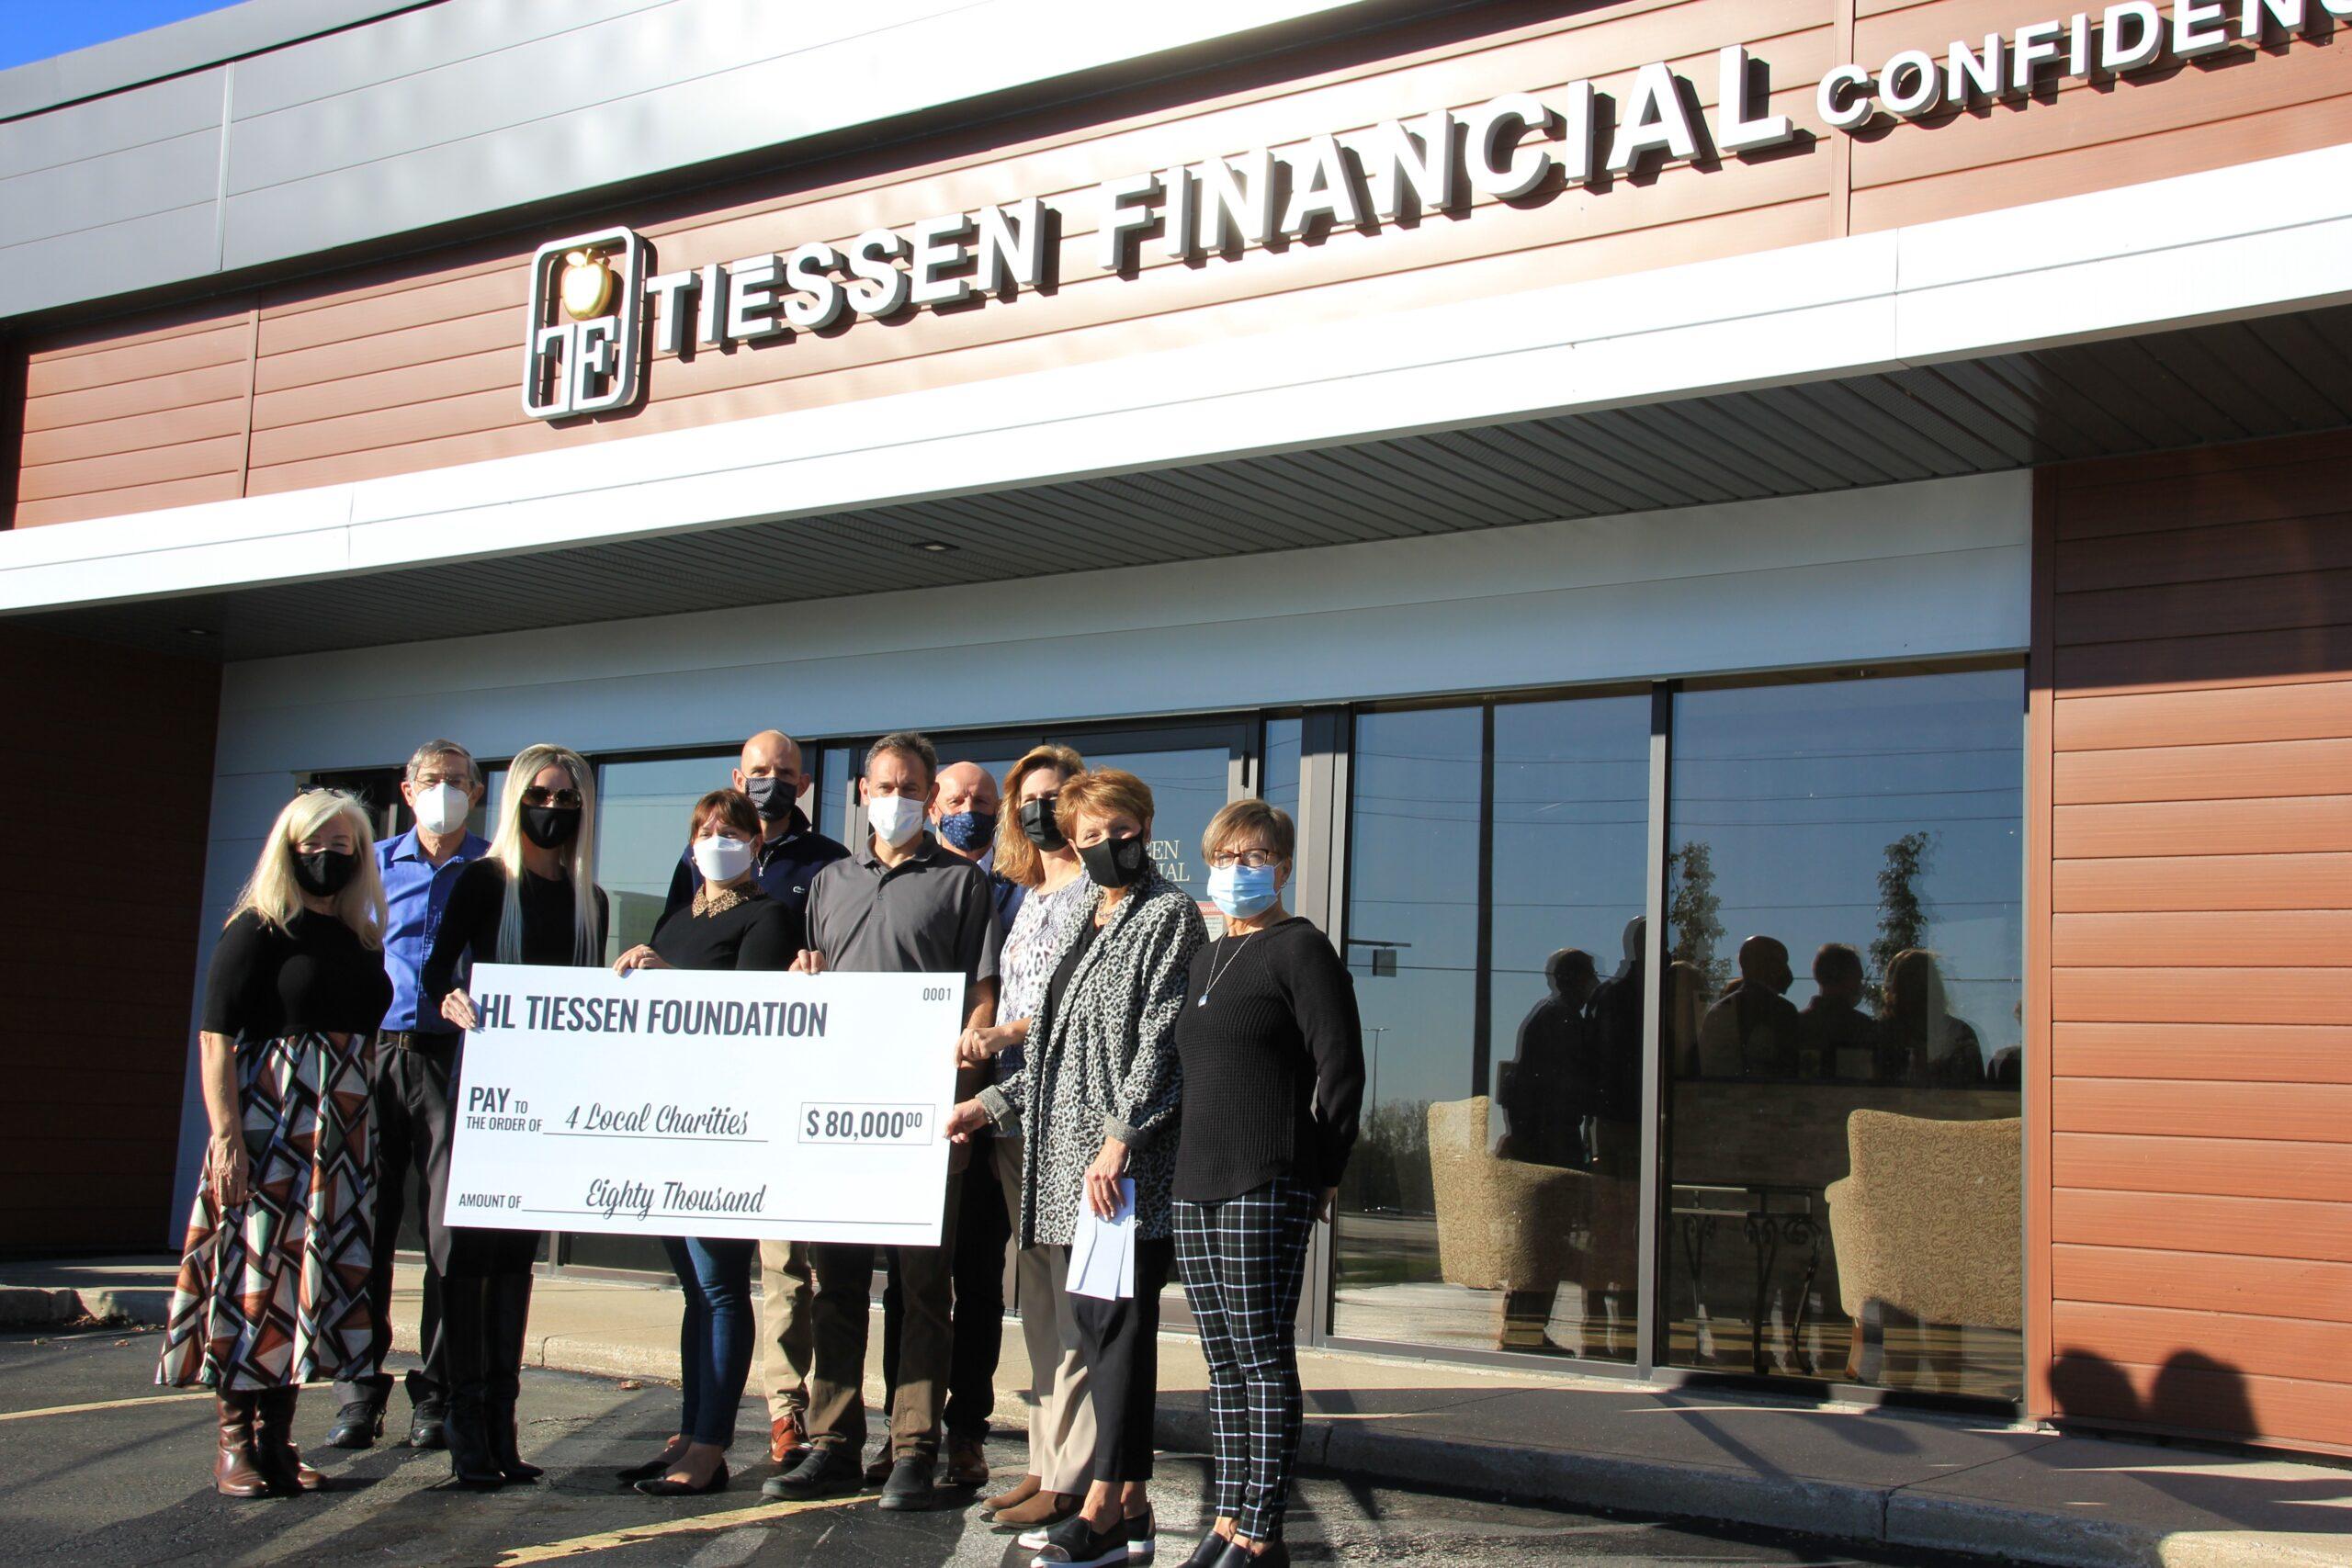 ESHF selected by HL Tiessen Foundation